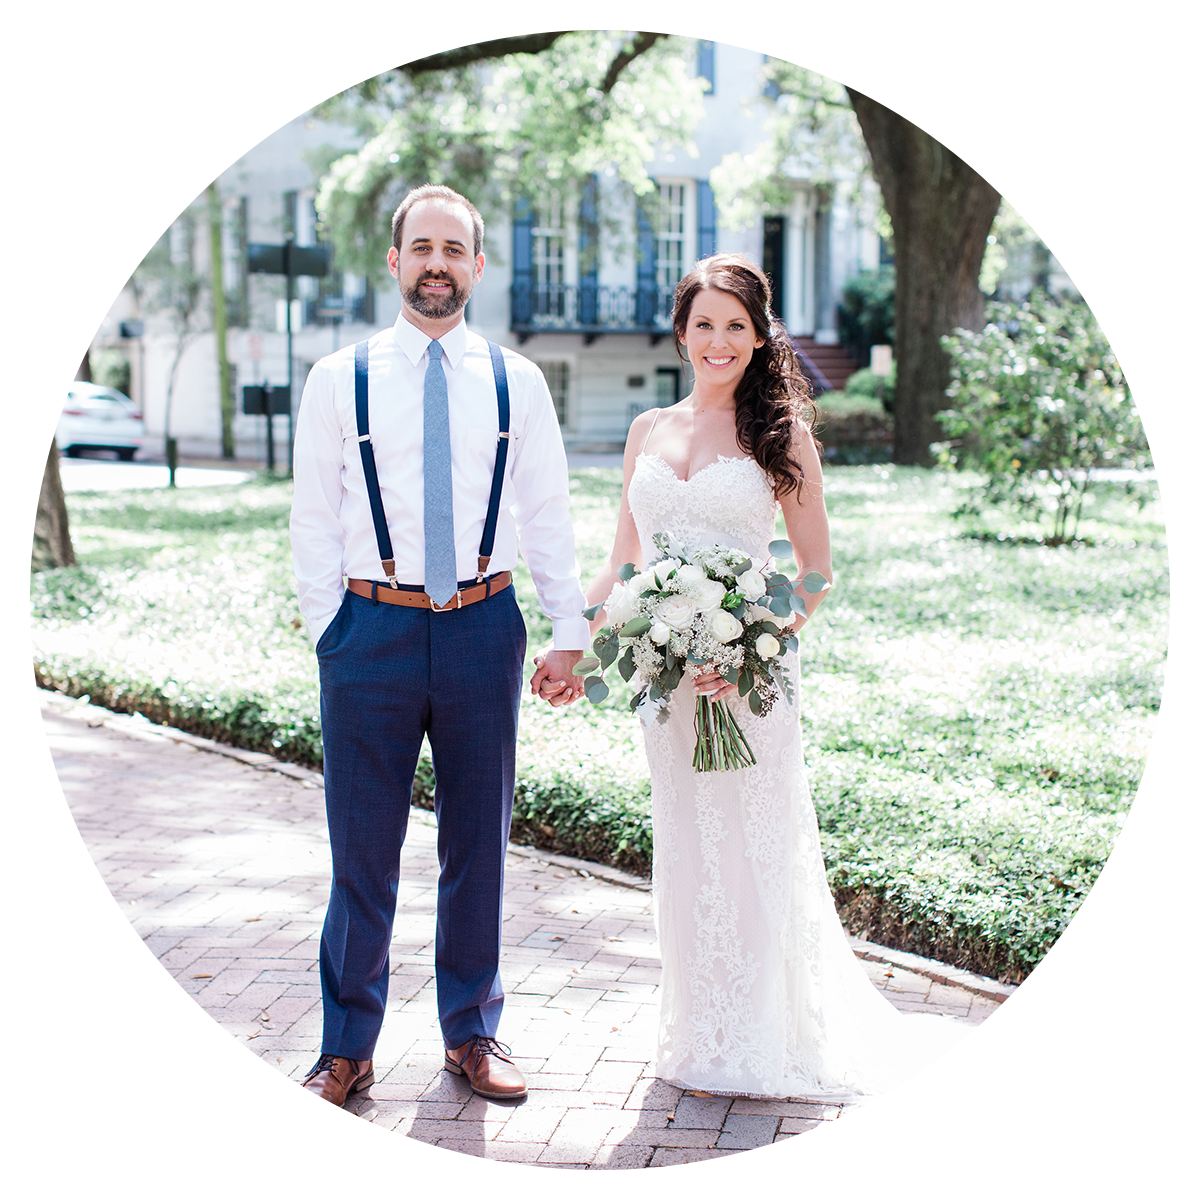 michelle-scott-savannah-historic-square-wedding-apt-b-photo-savannah-wedding-photorapher-savannah-elopement-photographer-savannah-weddings.png